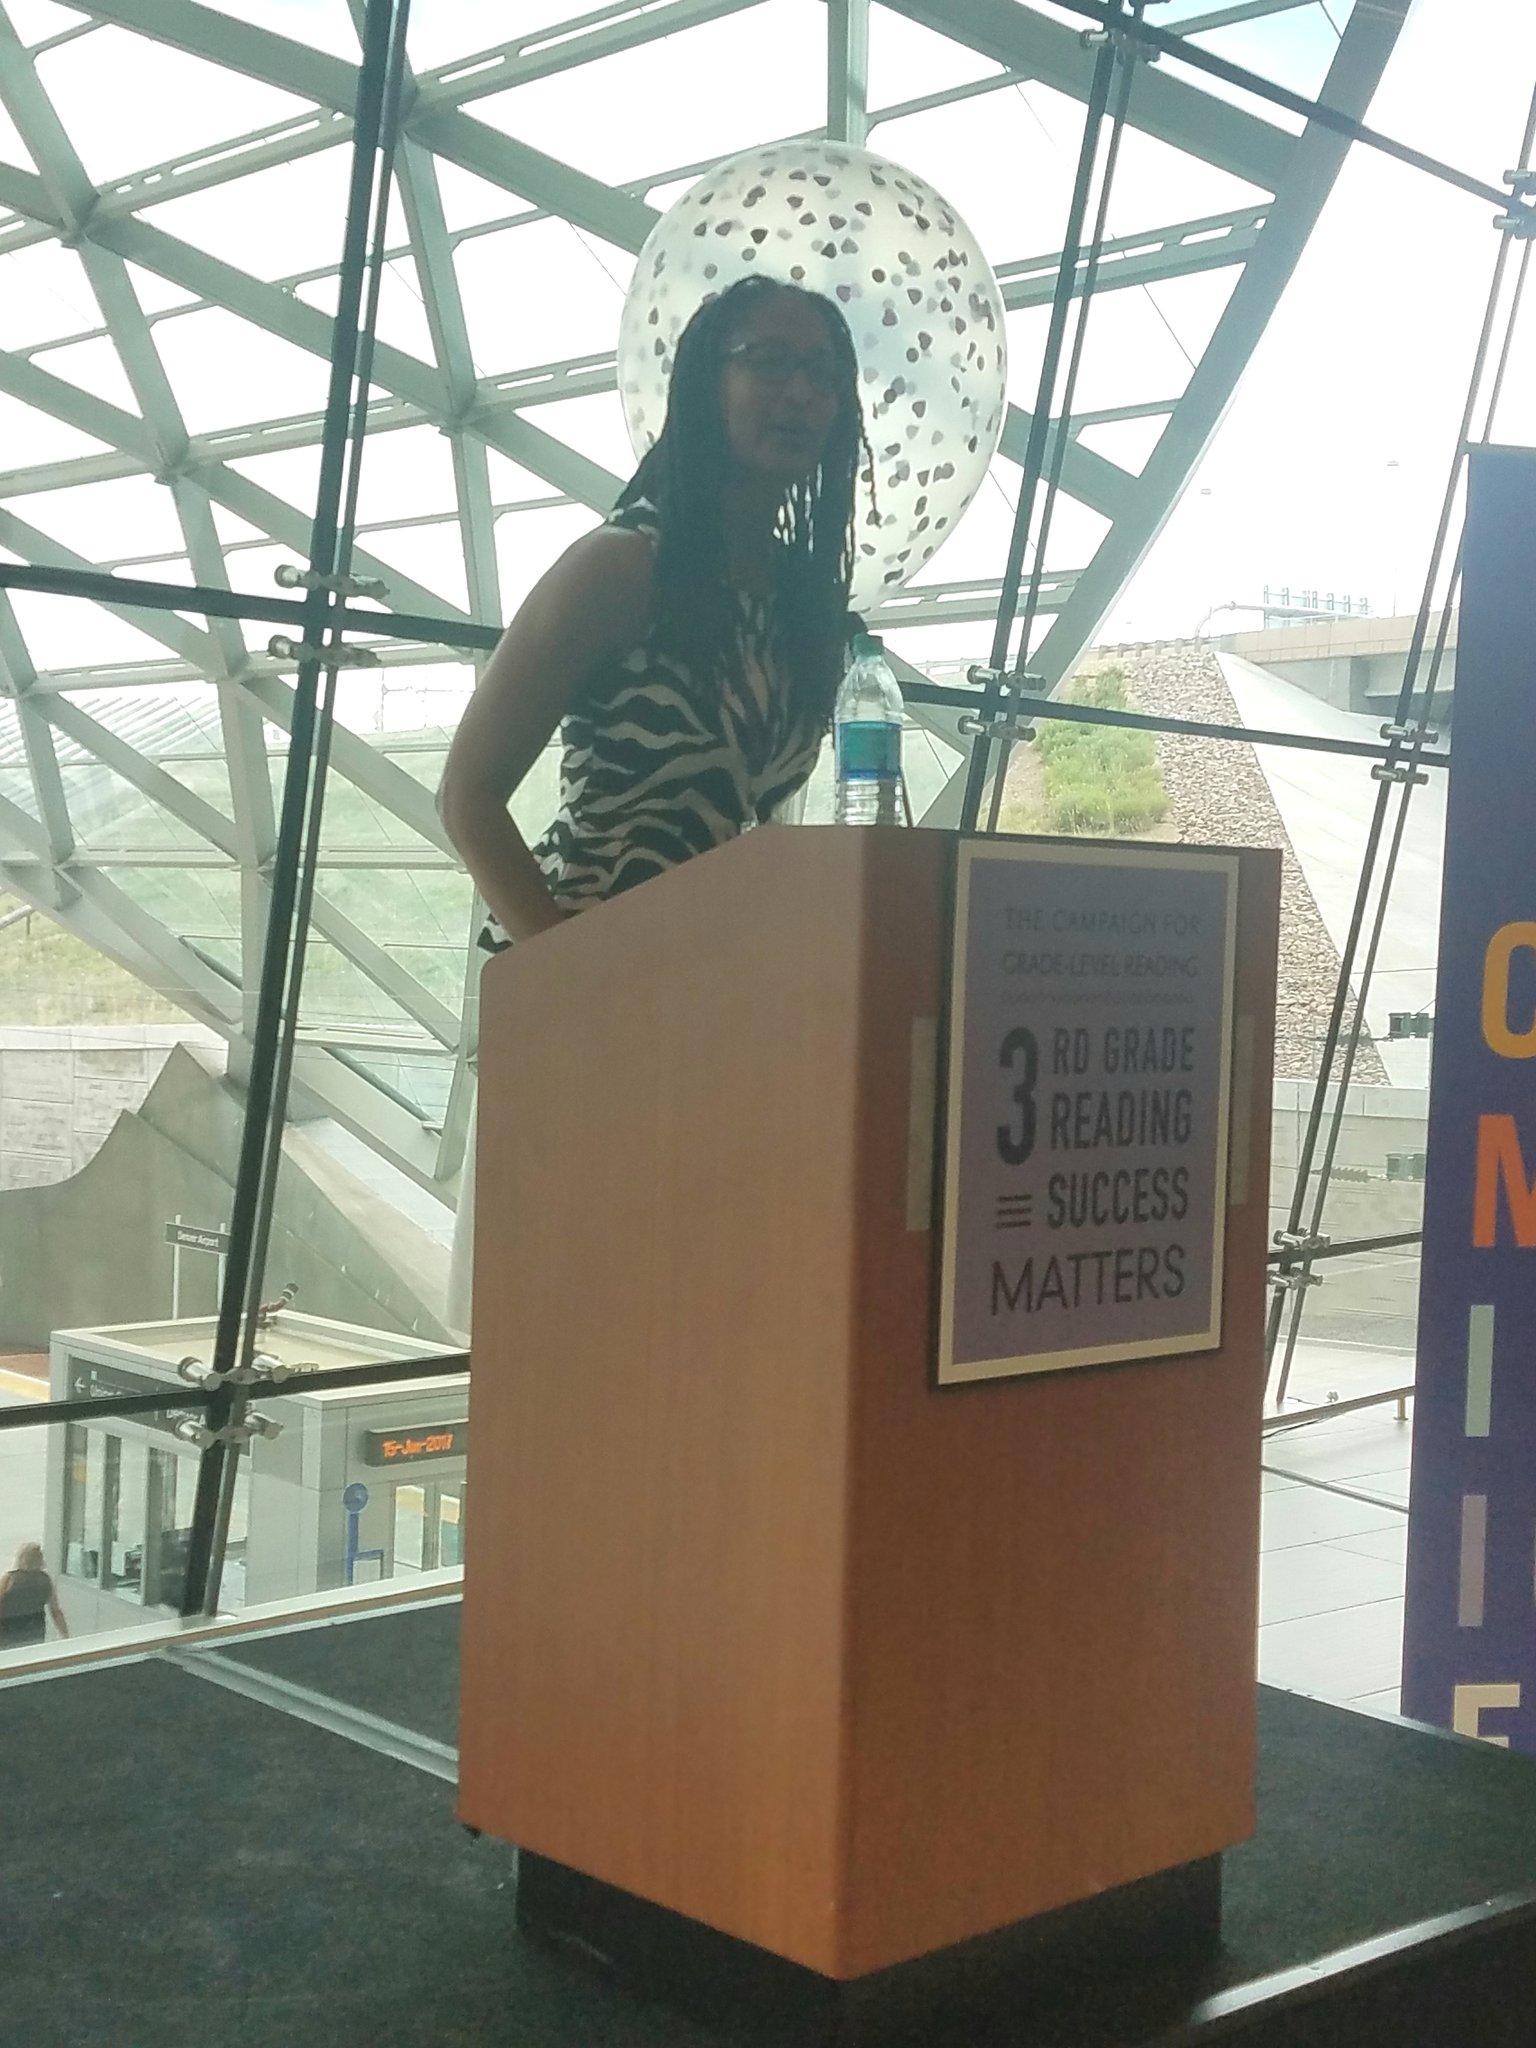 Angela Romans of @BrownUniversity kicks off the Communications Expo at #GLRWeek! https://t.co/vbogZzbVC6